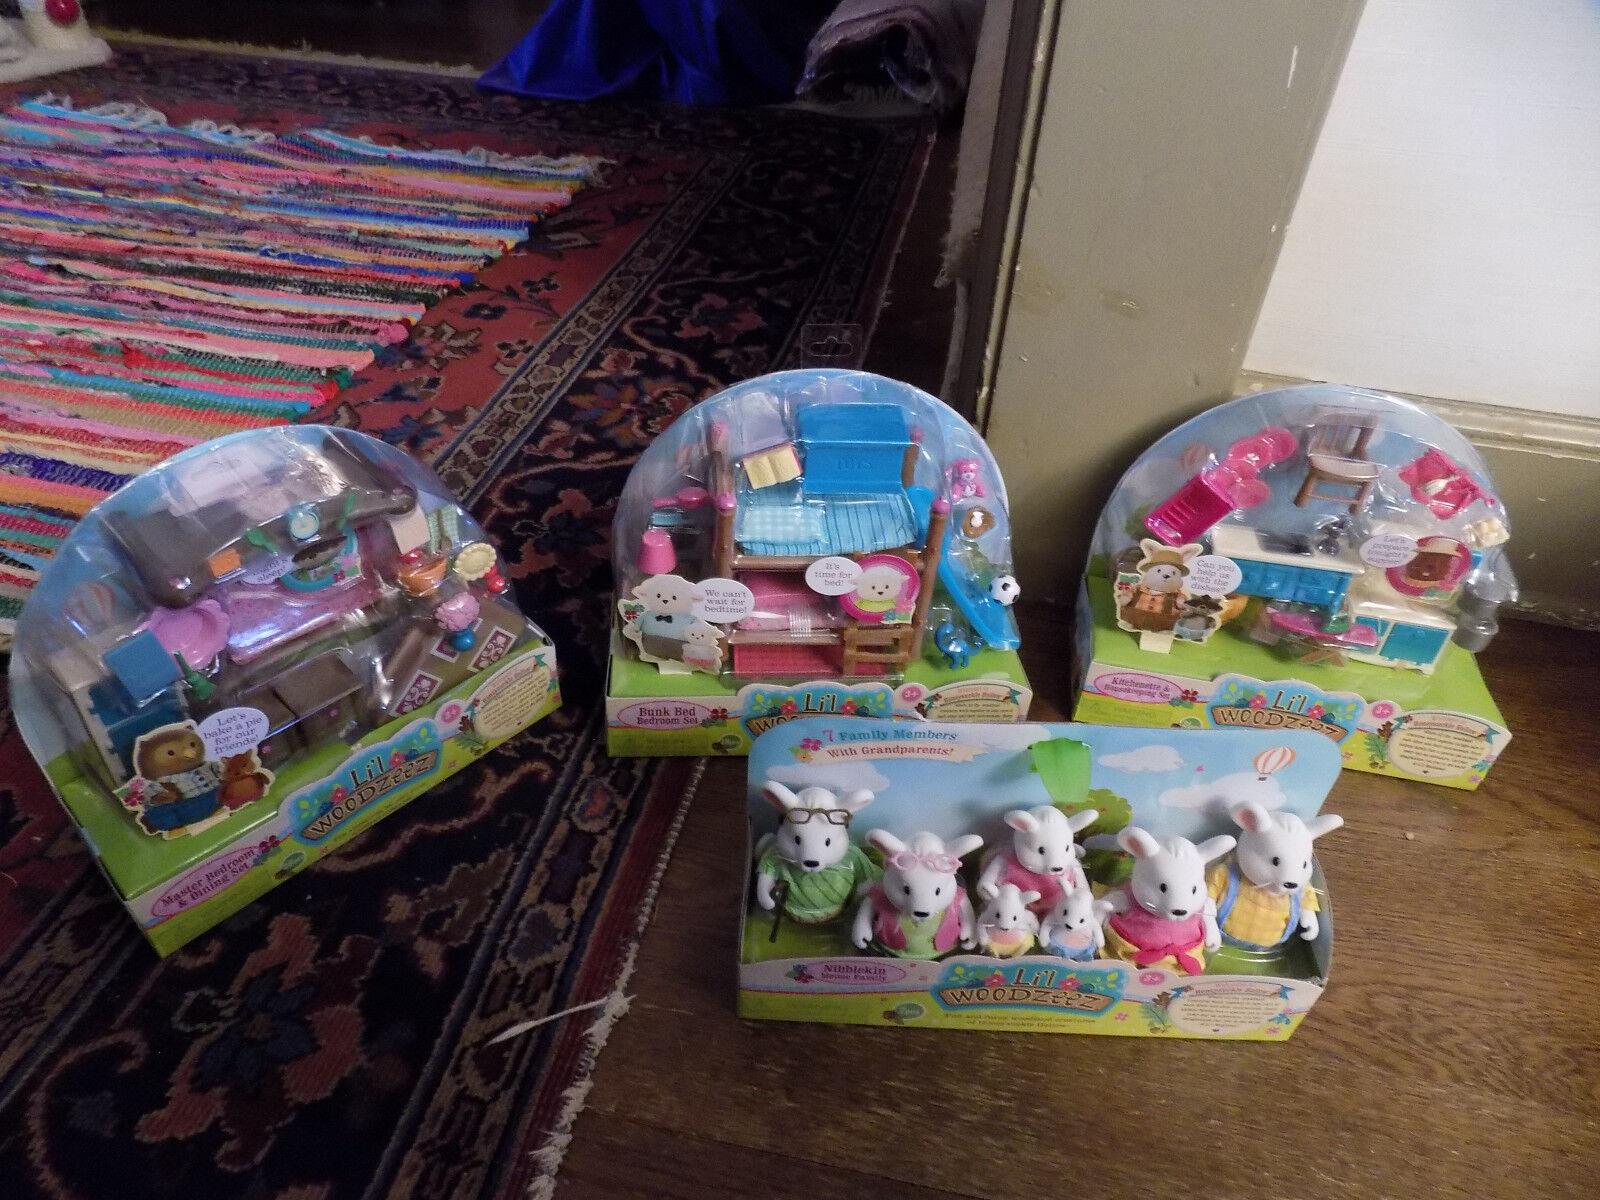 Kupit Lot New Li L Woodzeez Nibblekin Mouse Family Grandparents Na Aukcion Iz Ameriki S Dostavkoj V Rossiyu Ukrainu Kazahstan